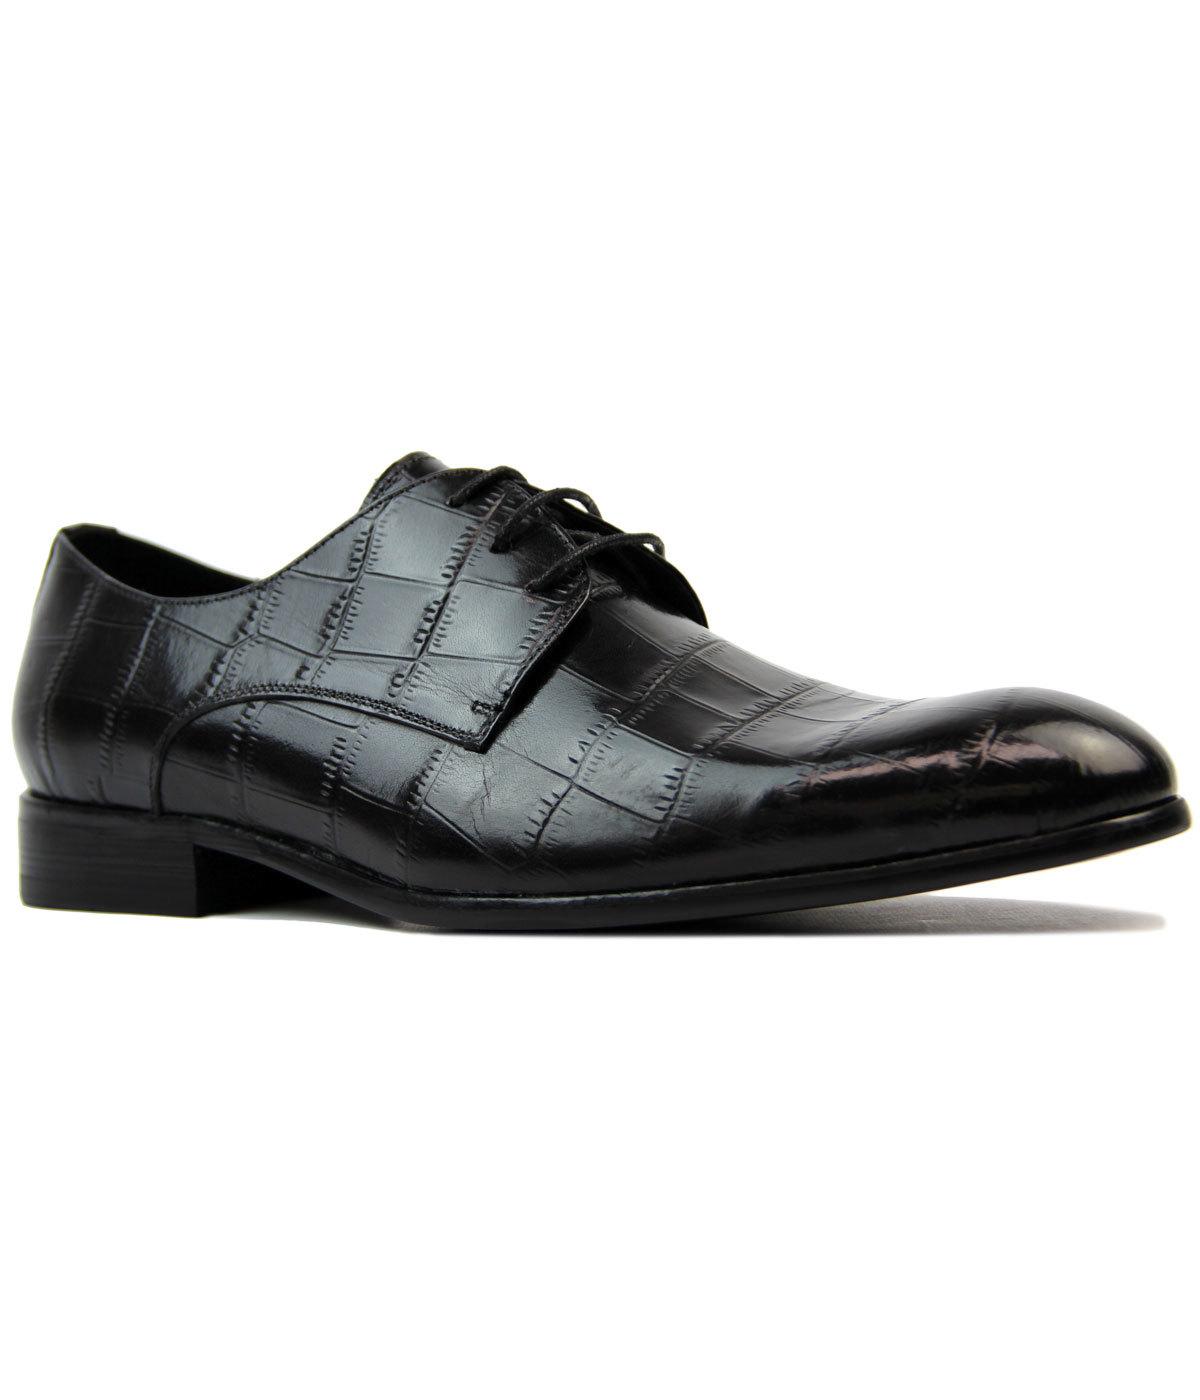 Padbury PAOLO VANDINI Retro Croc Stamp Dress Shoes